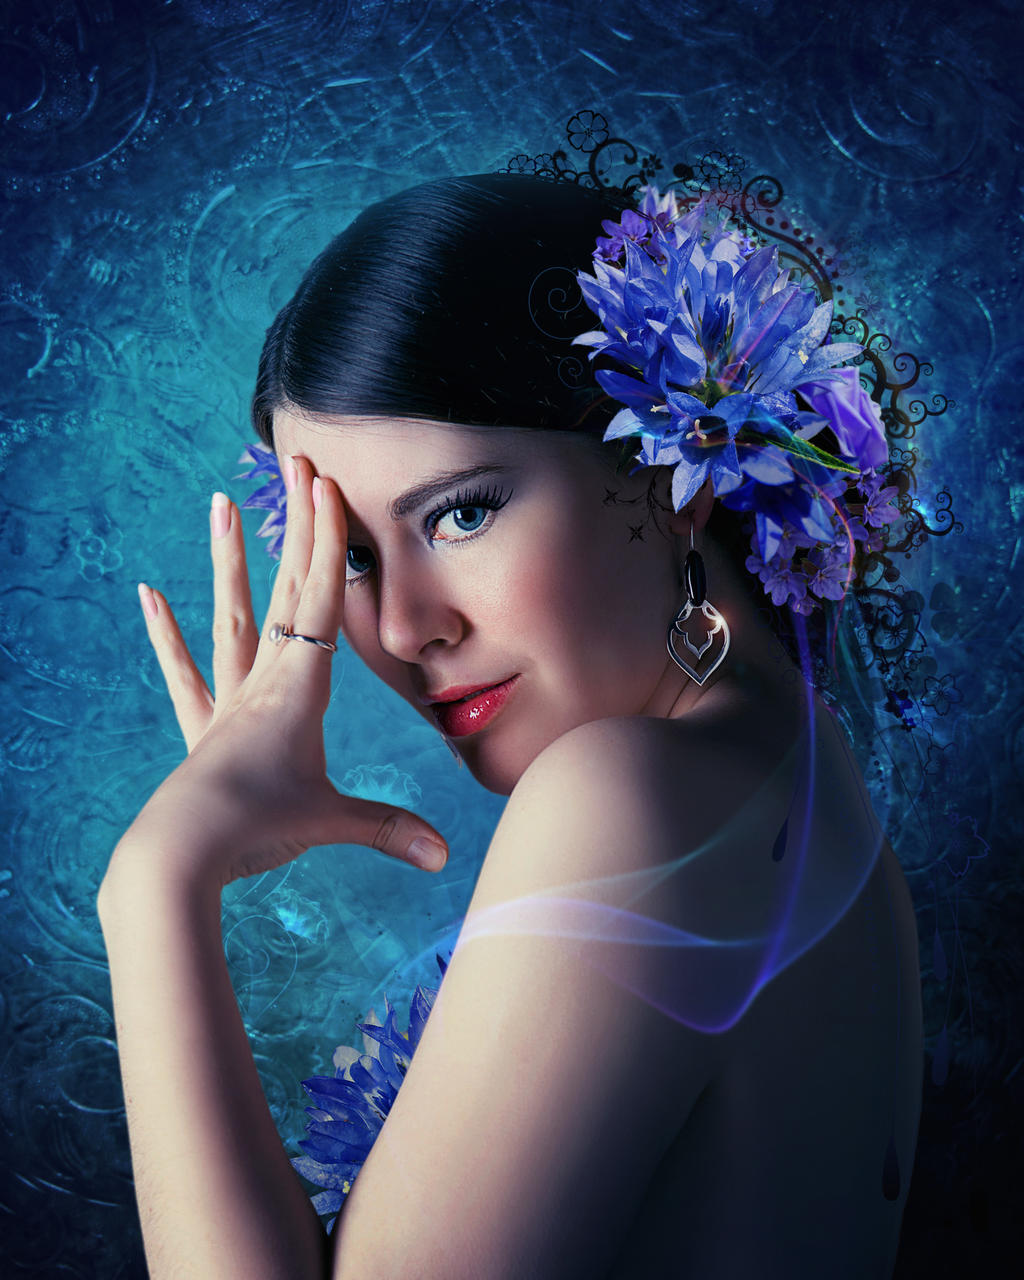 Blue flowers2 by IgnisFatuusII